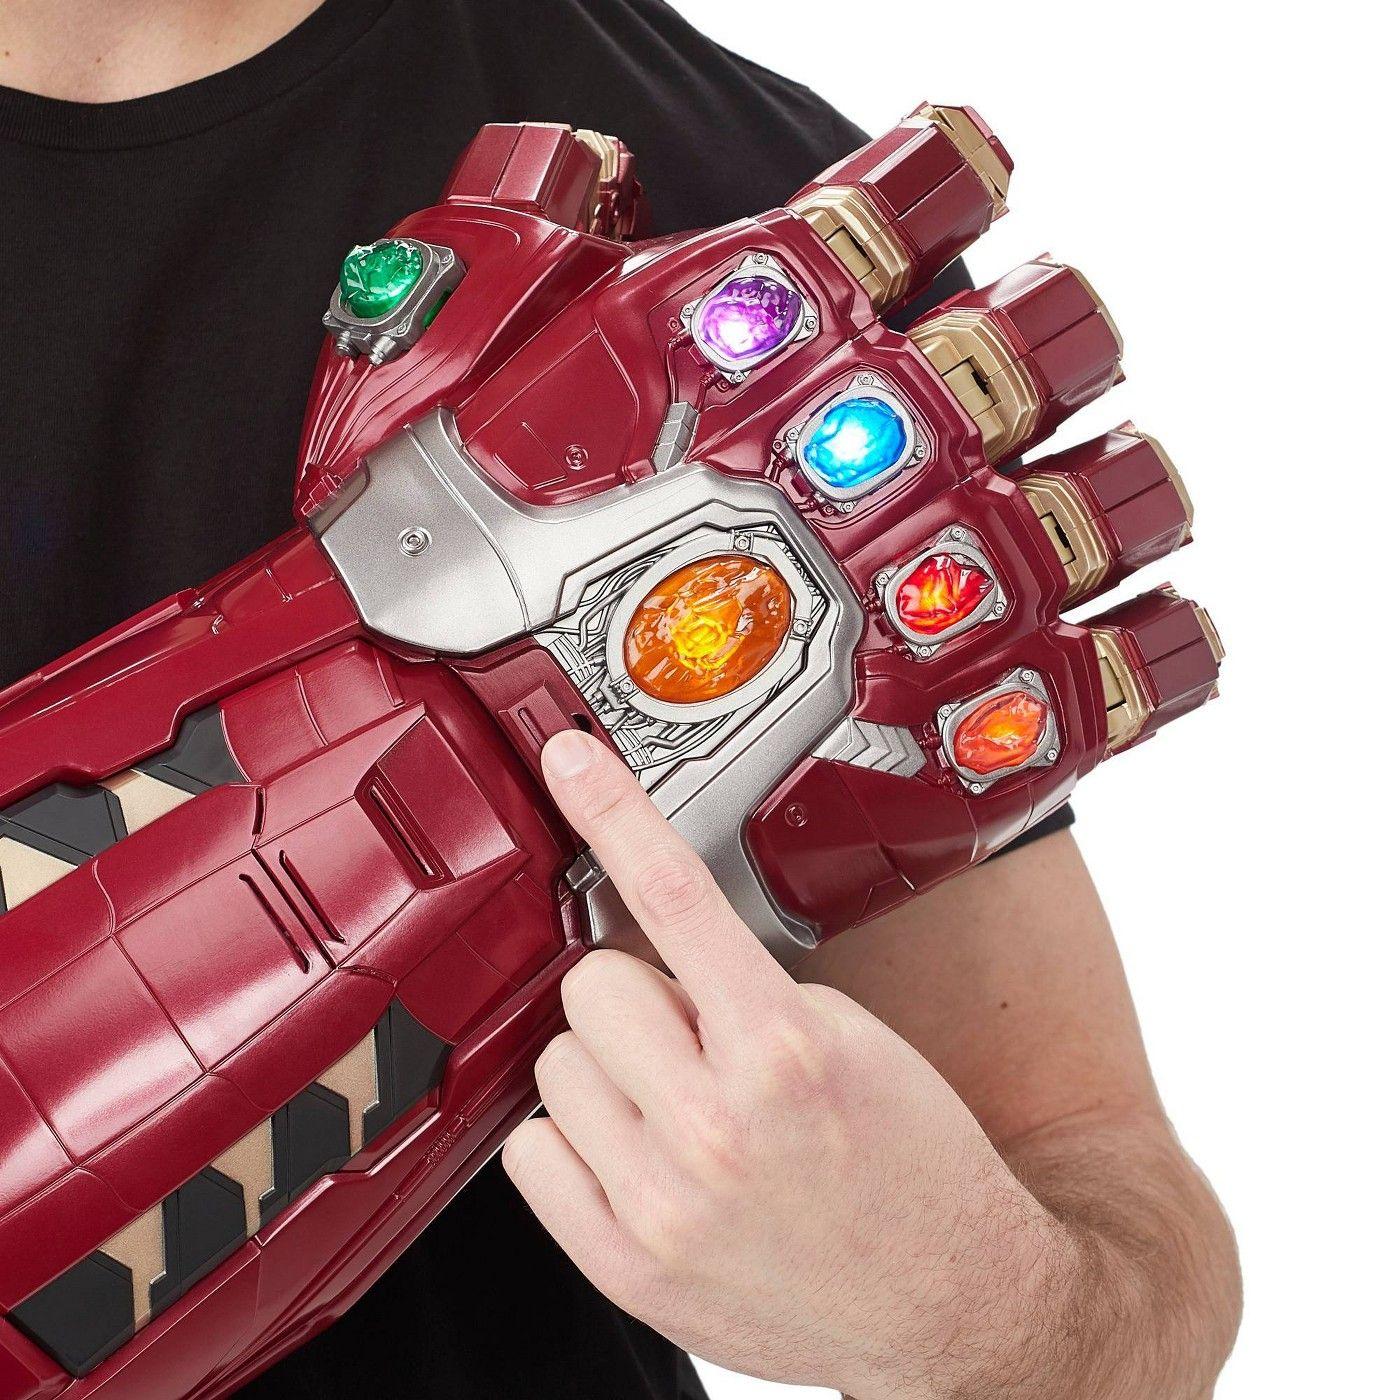 Marvel Legends Series Avengers Endgame Articulated Power Gauntlet Fist IN STOCK!